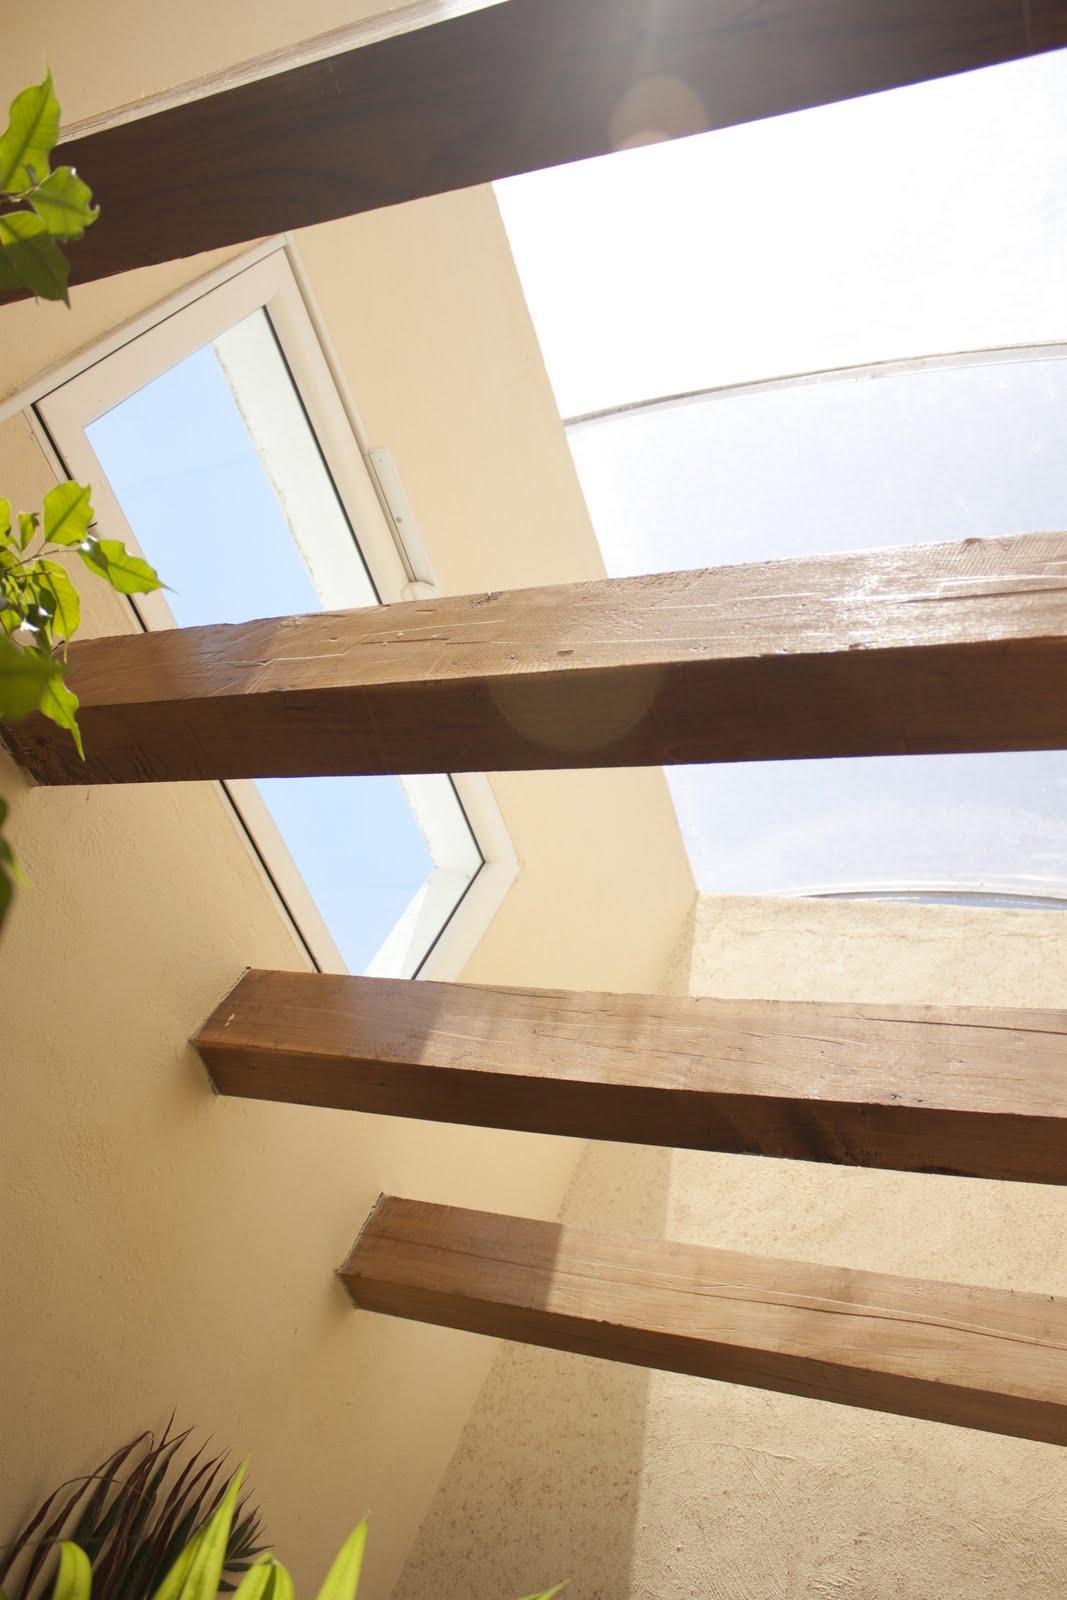 Interiores arquitect nicos pinkaiz - Vigas de madera para techos ...